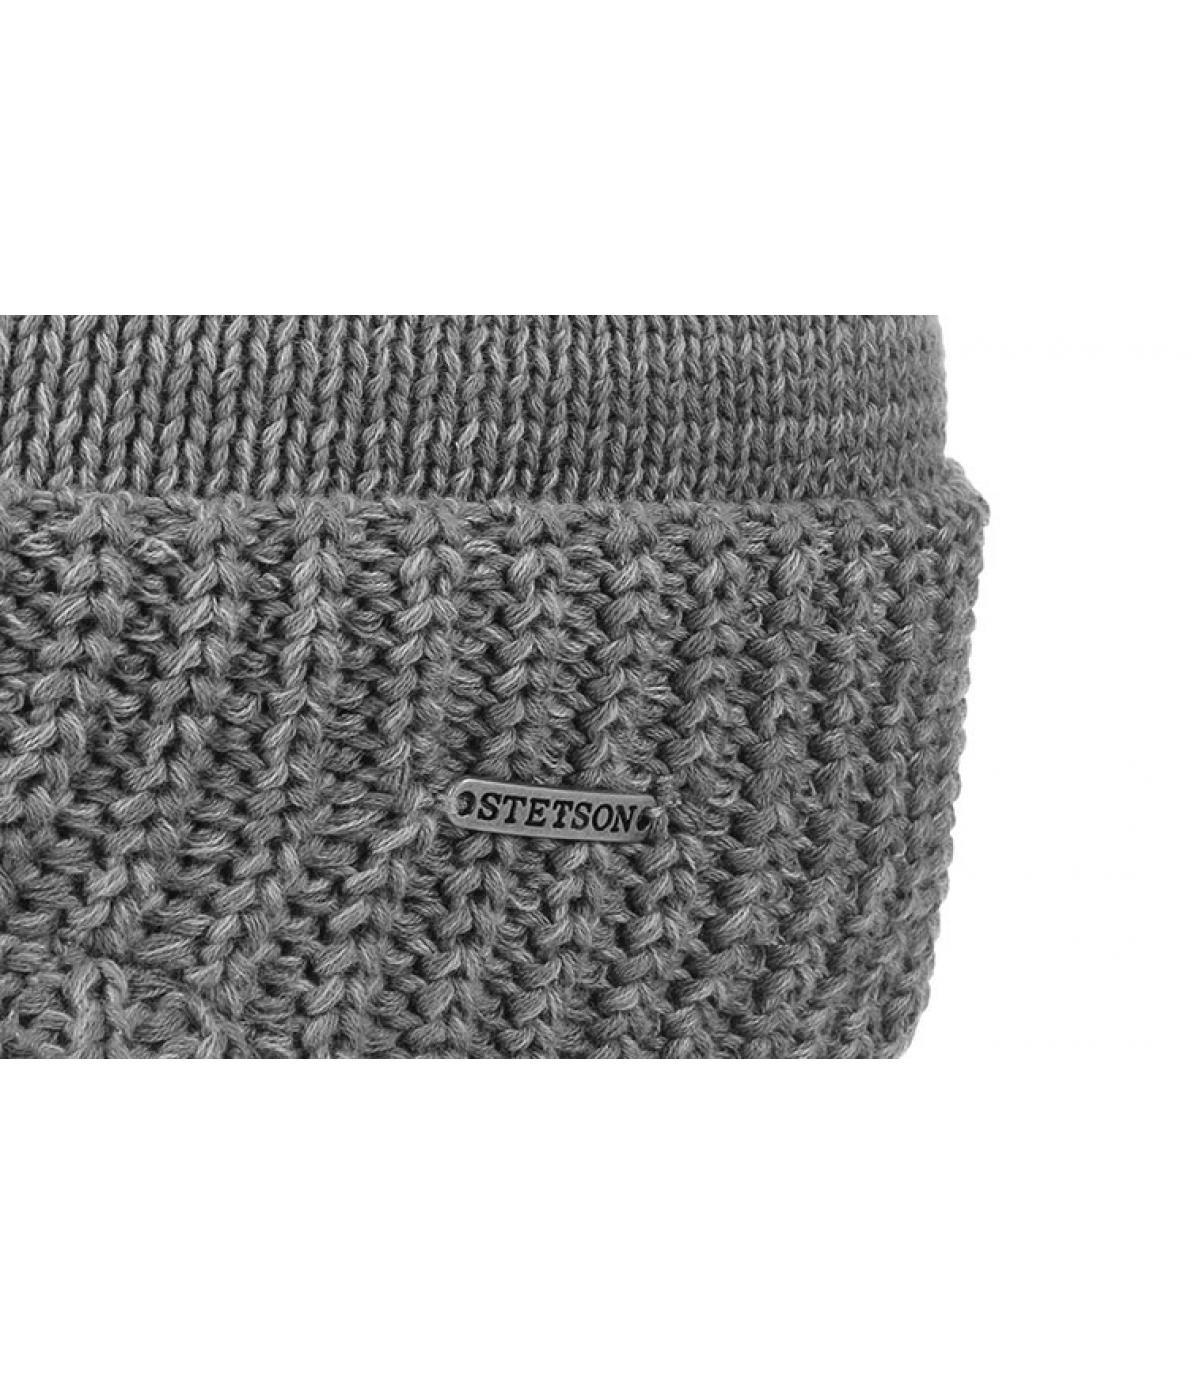 Dettagli Beanie Cooton Knit grey mix - image 3